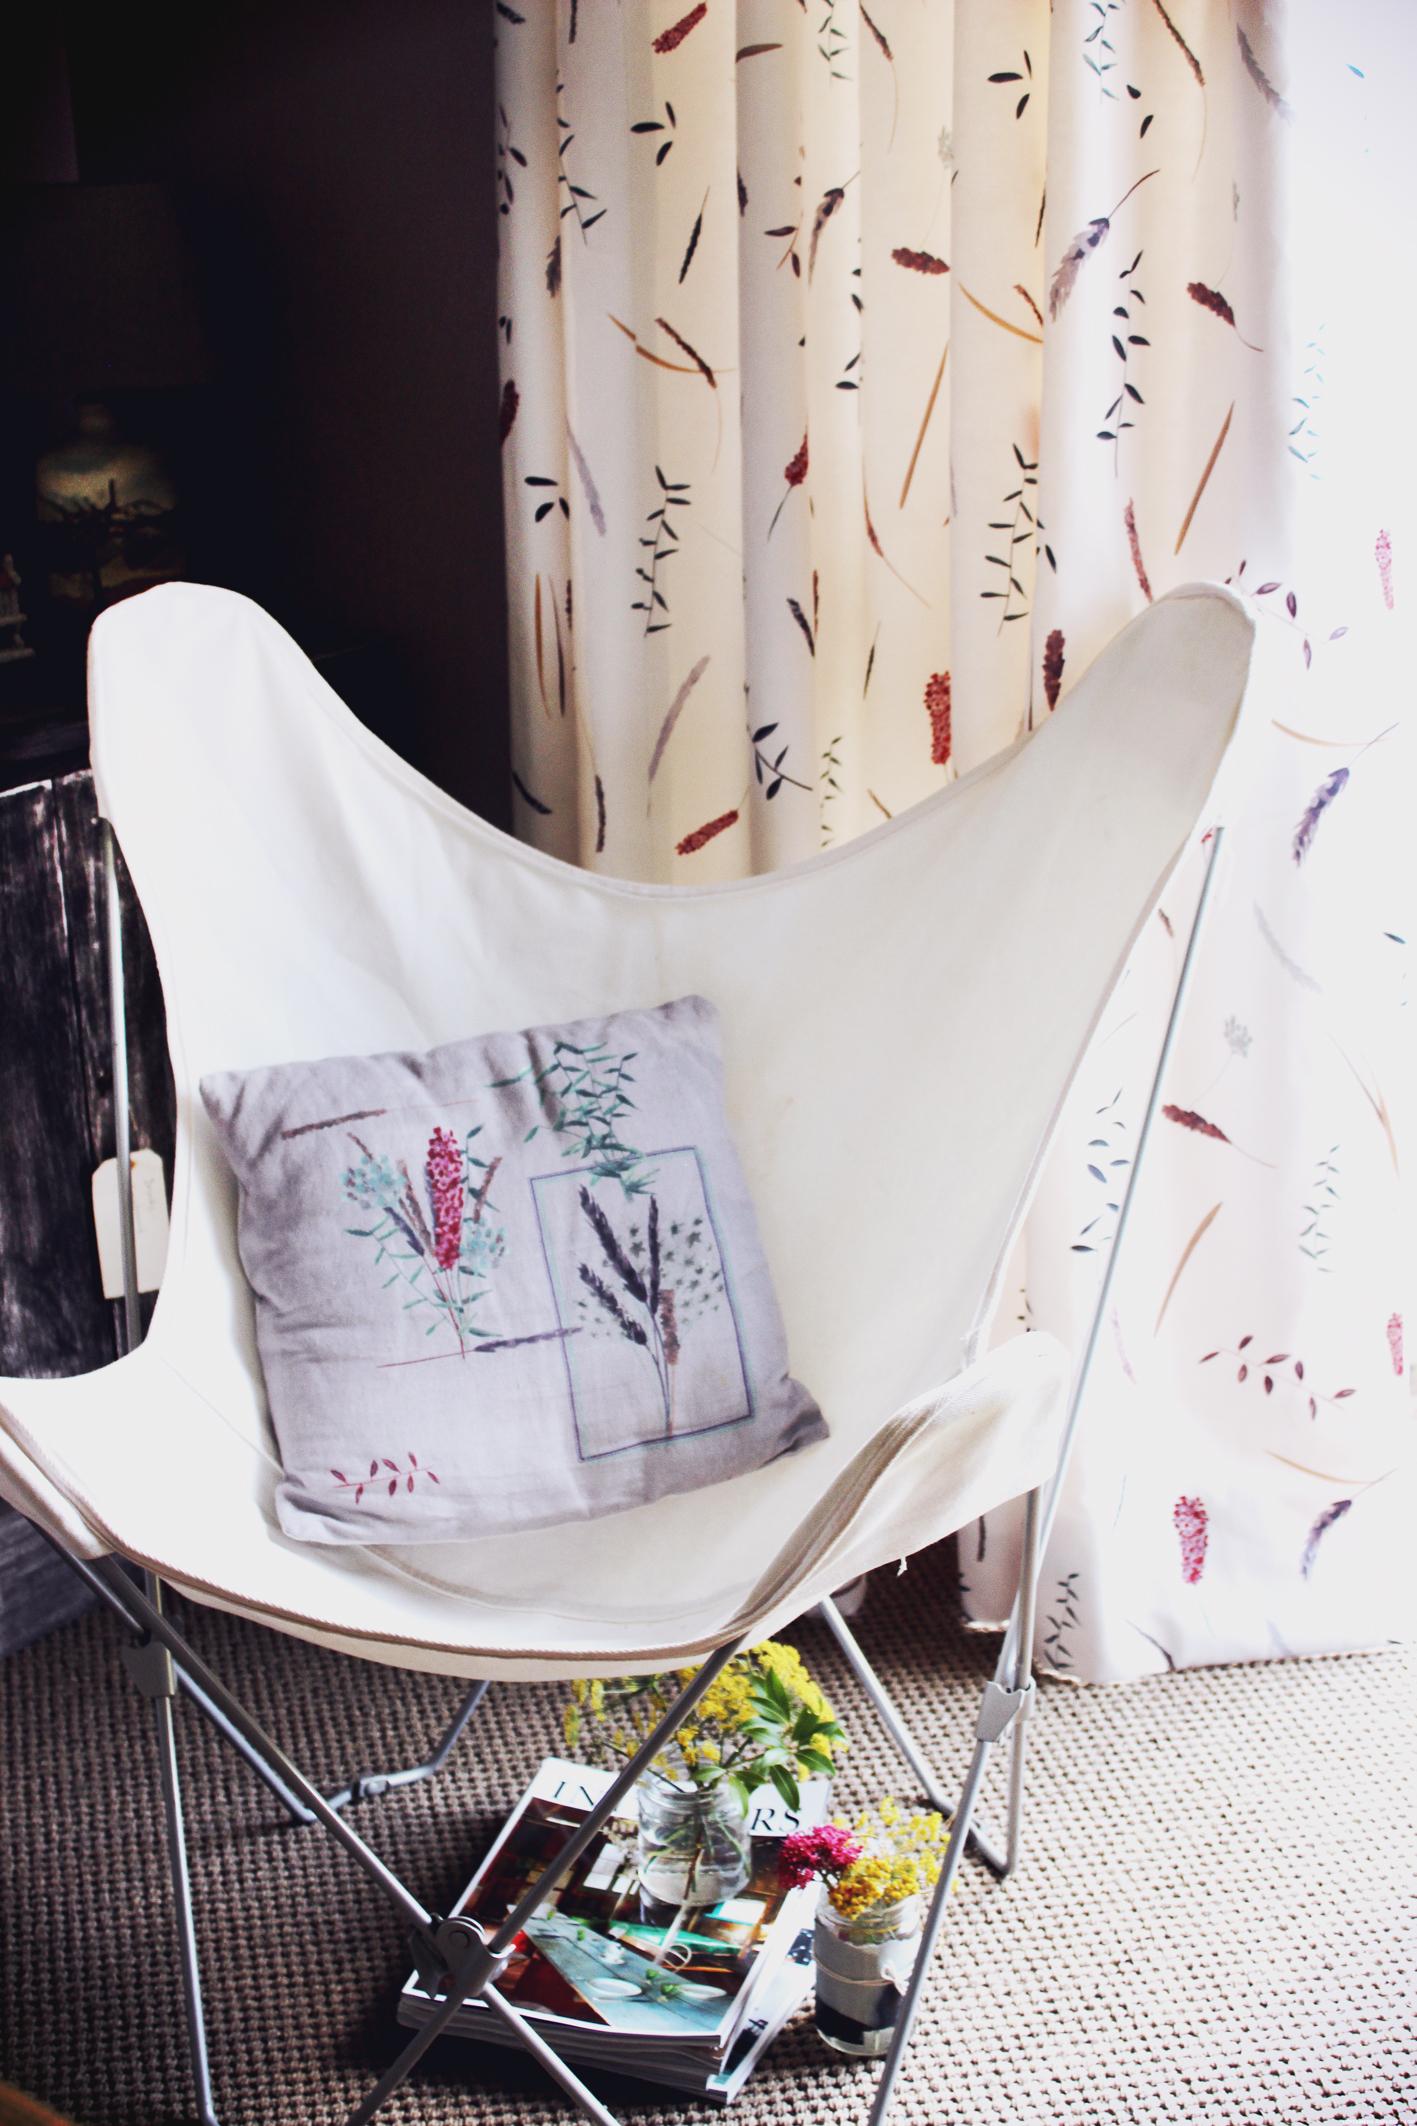 rebecca collingridge stalks chair.jpg